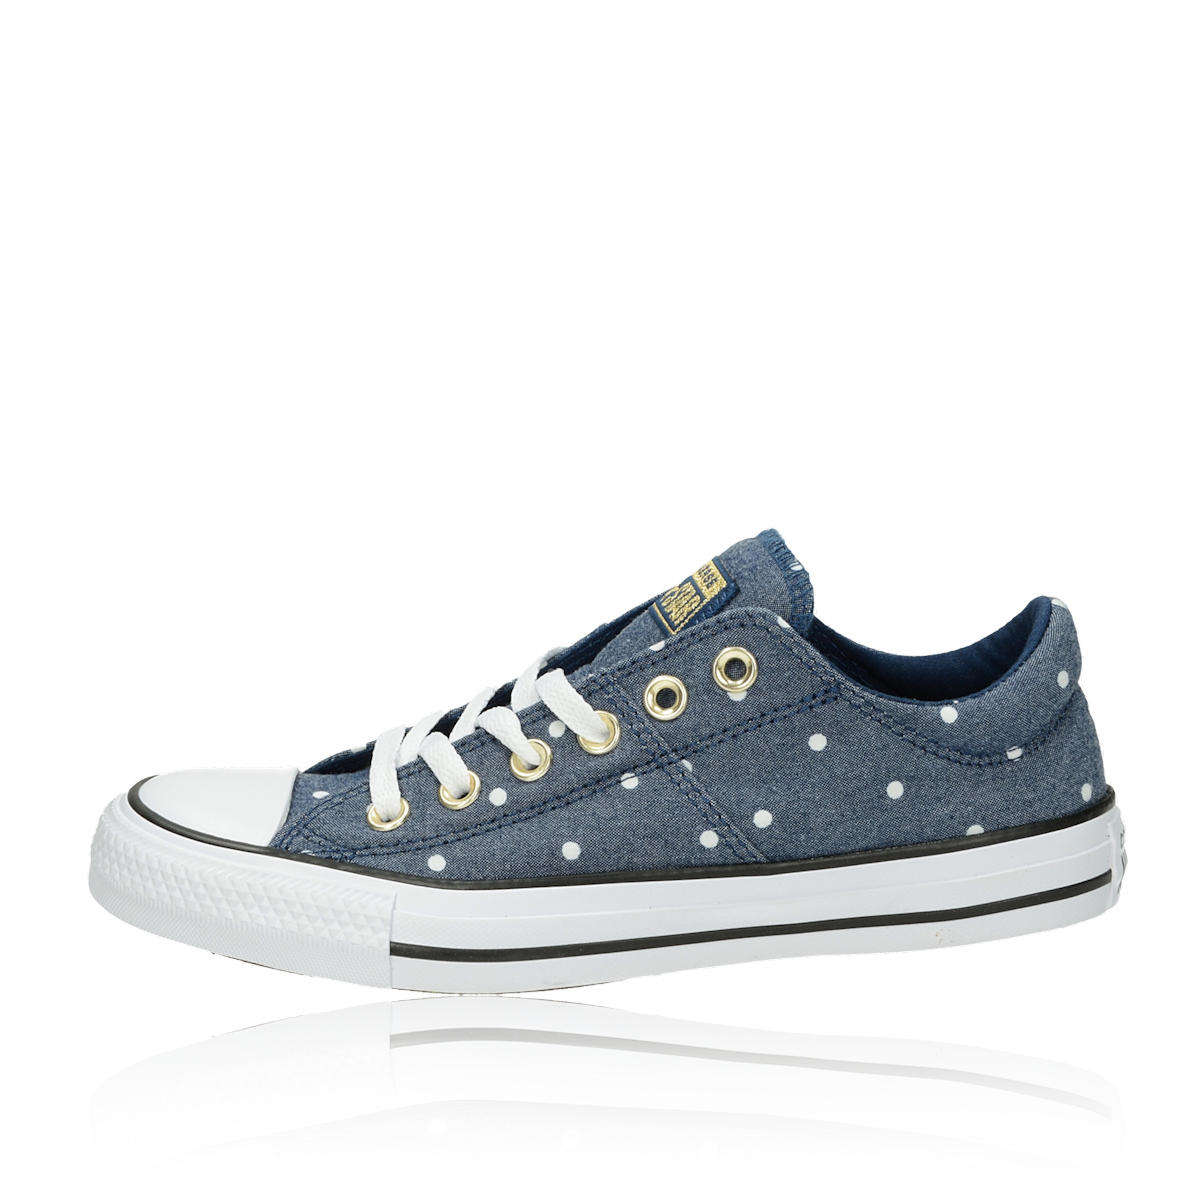 ... Converse dámske tenisky s bodkovaným motívom - modré ... 741f3ddb54a